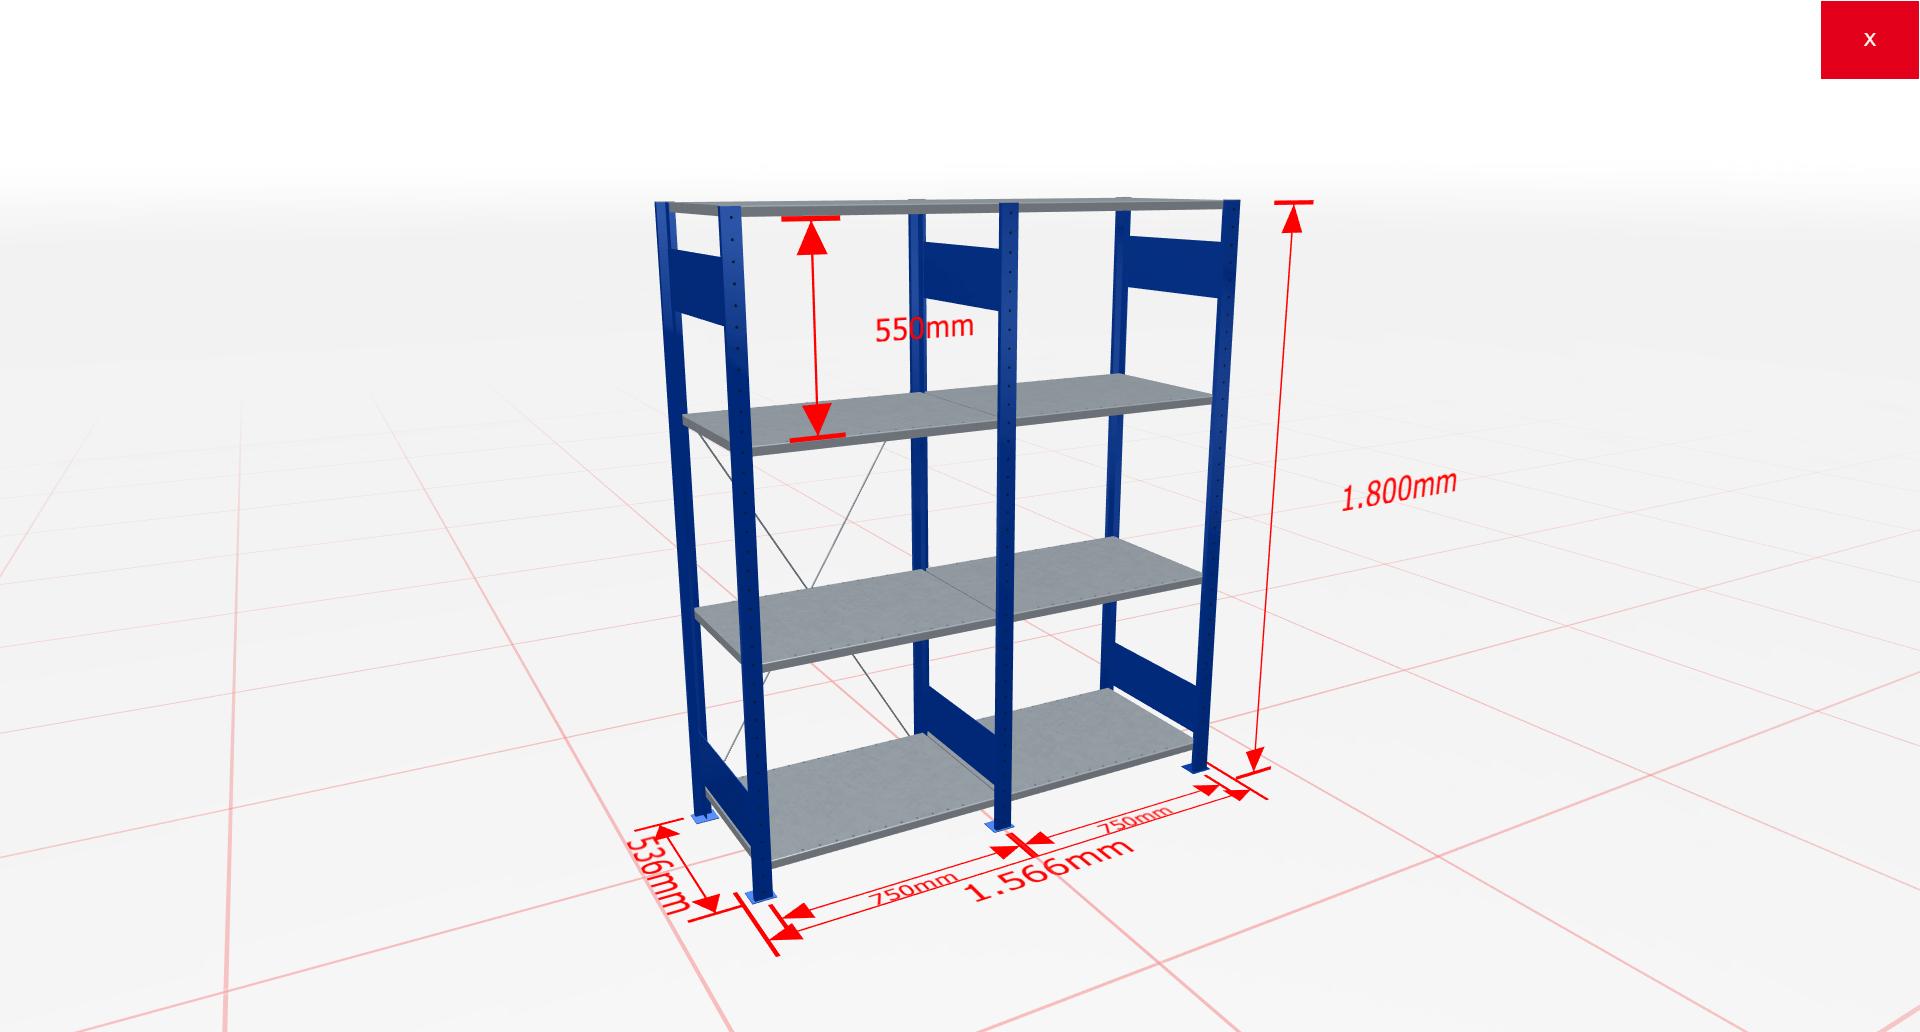 Fachbodenregal Komplettregal 1800x1566x500 mm (HxBxT) SCHULTE Lagertechnik blau 4 Ebenen  150 kg je Boden